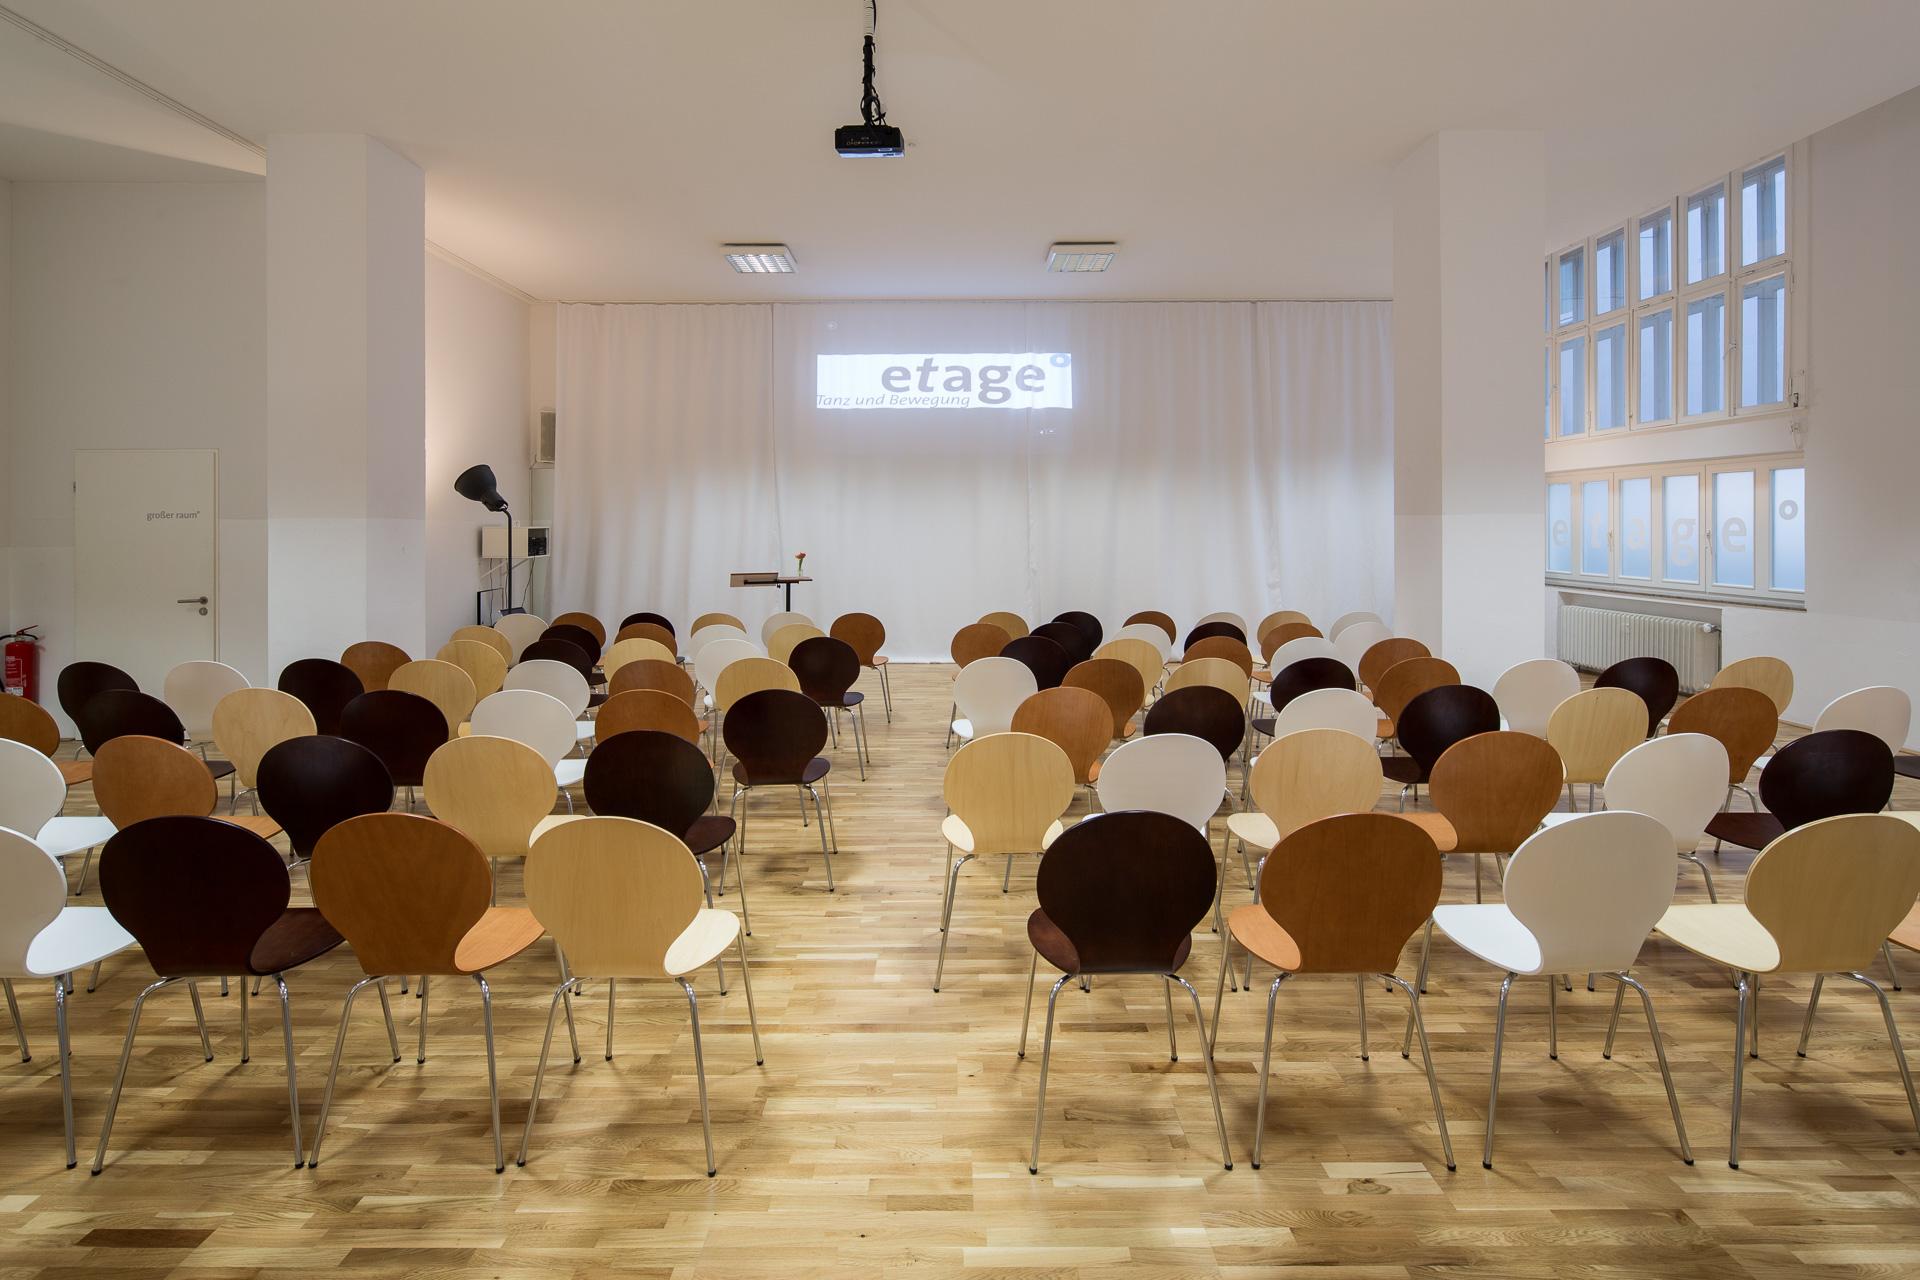 etage° Bremen